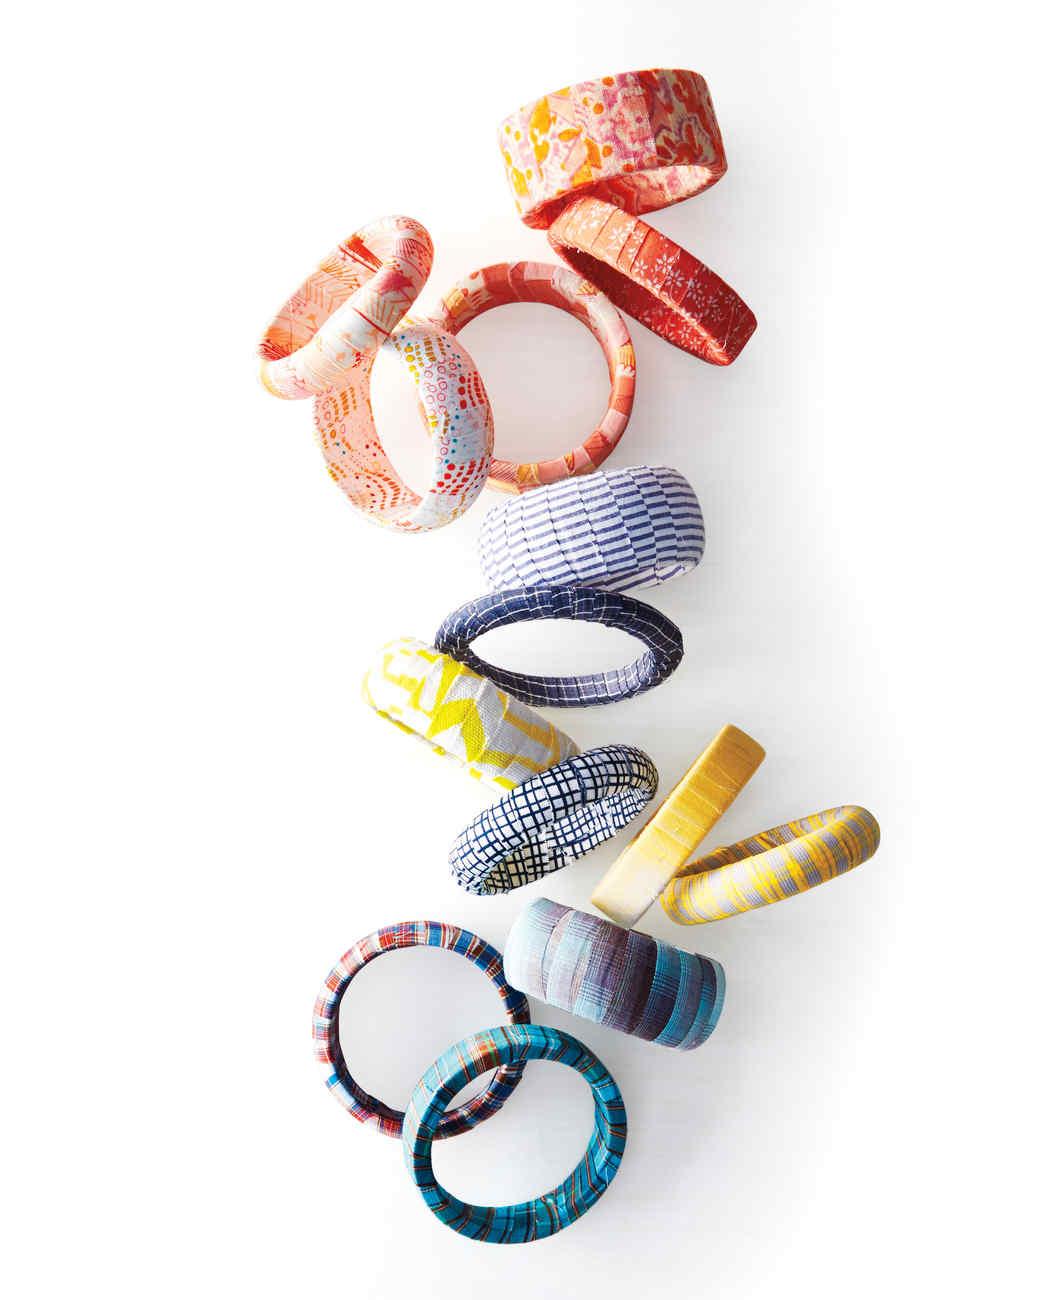 Arm Candy: Upcycled Bangle Bracelets